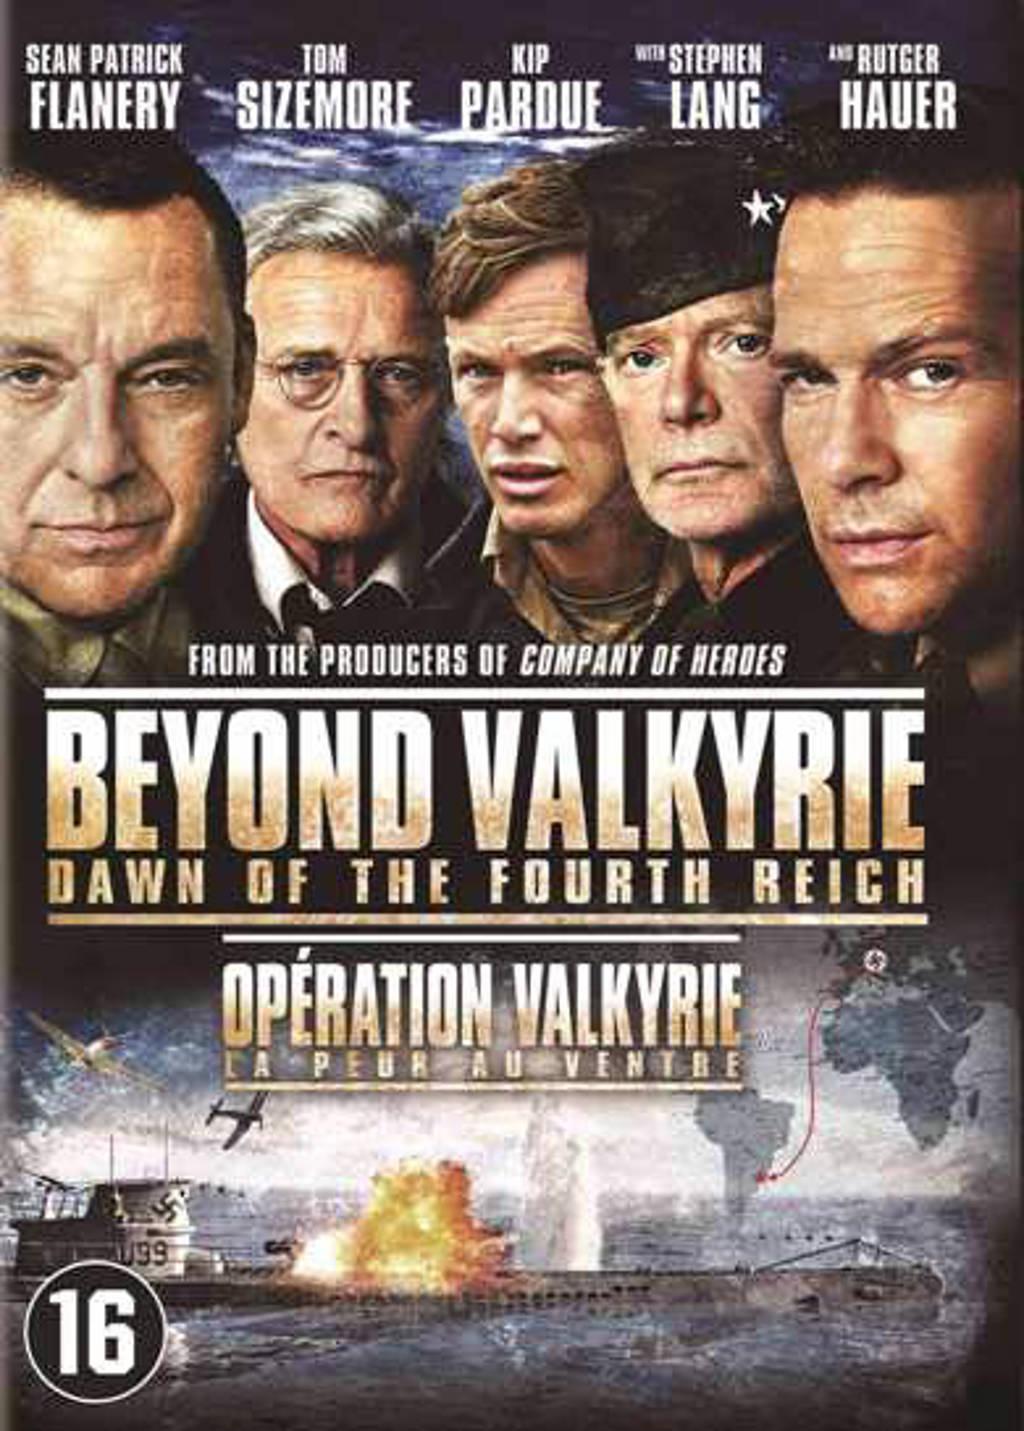 Beyond Valkyrie - Dawn of the fourth reich (DVD)